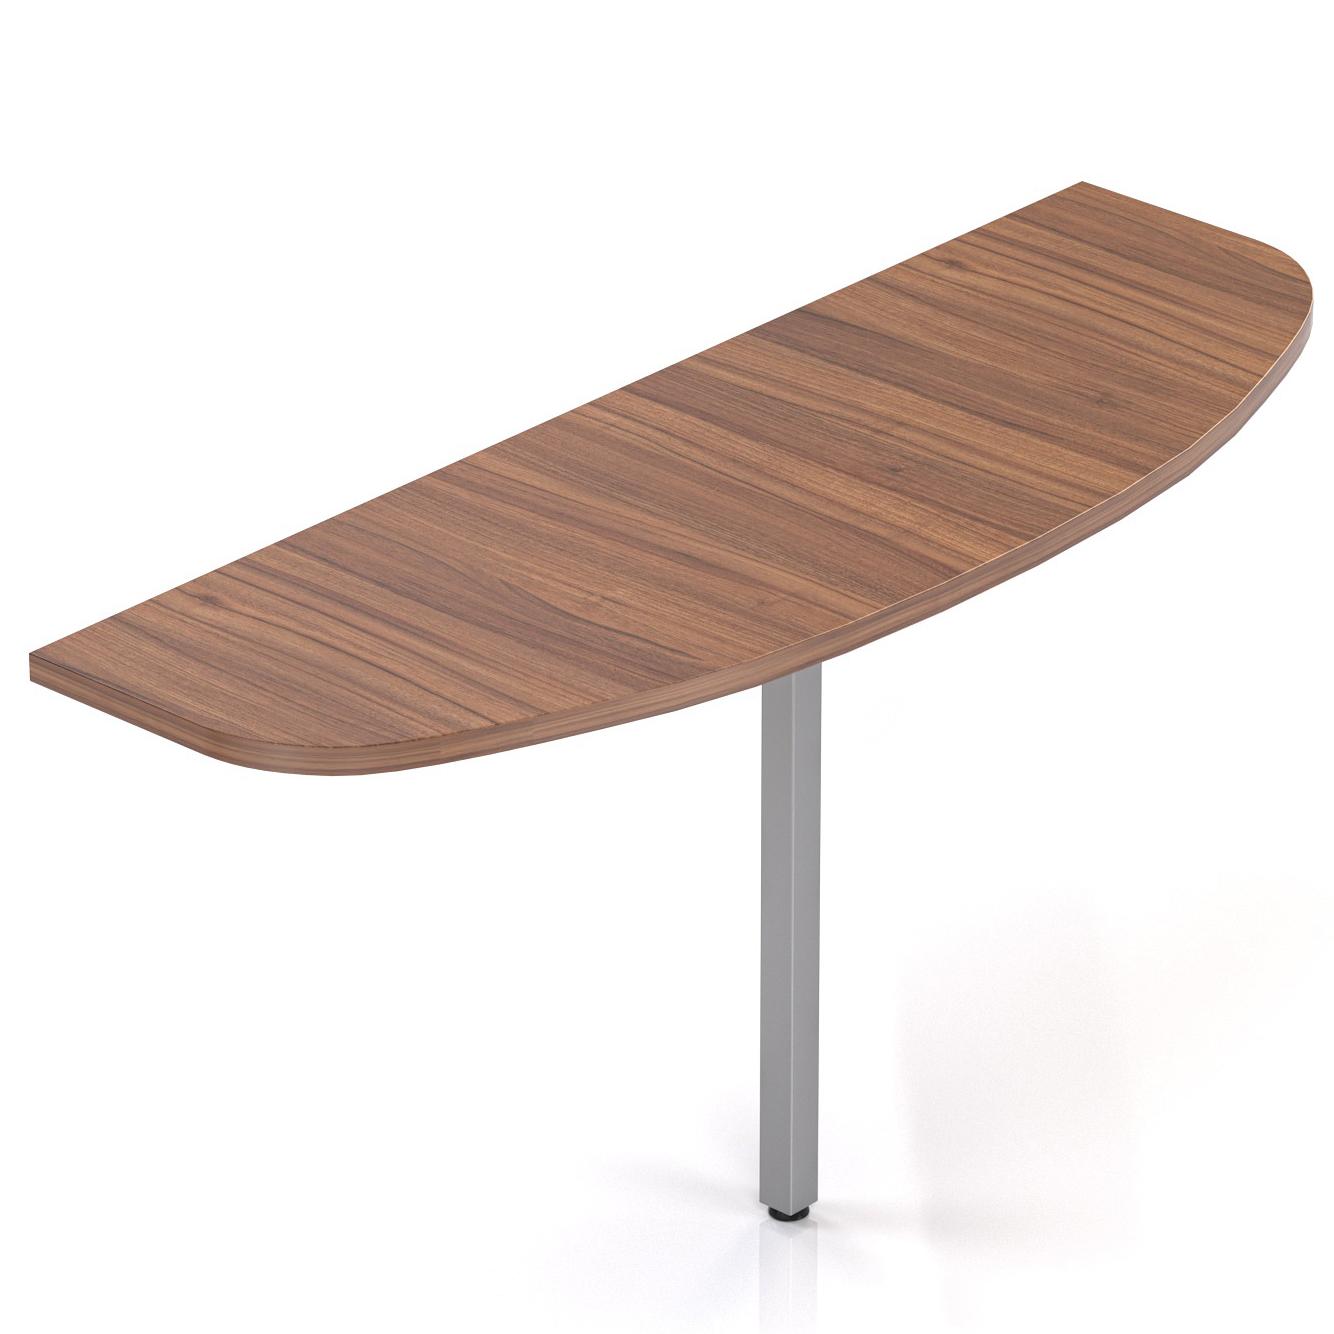 Prístavný stôl Komfort 140x50 cm - PR71 19